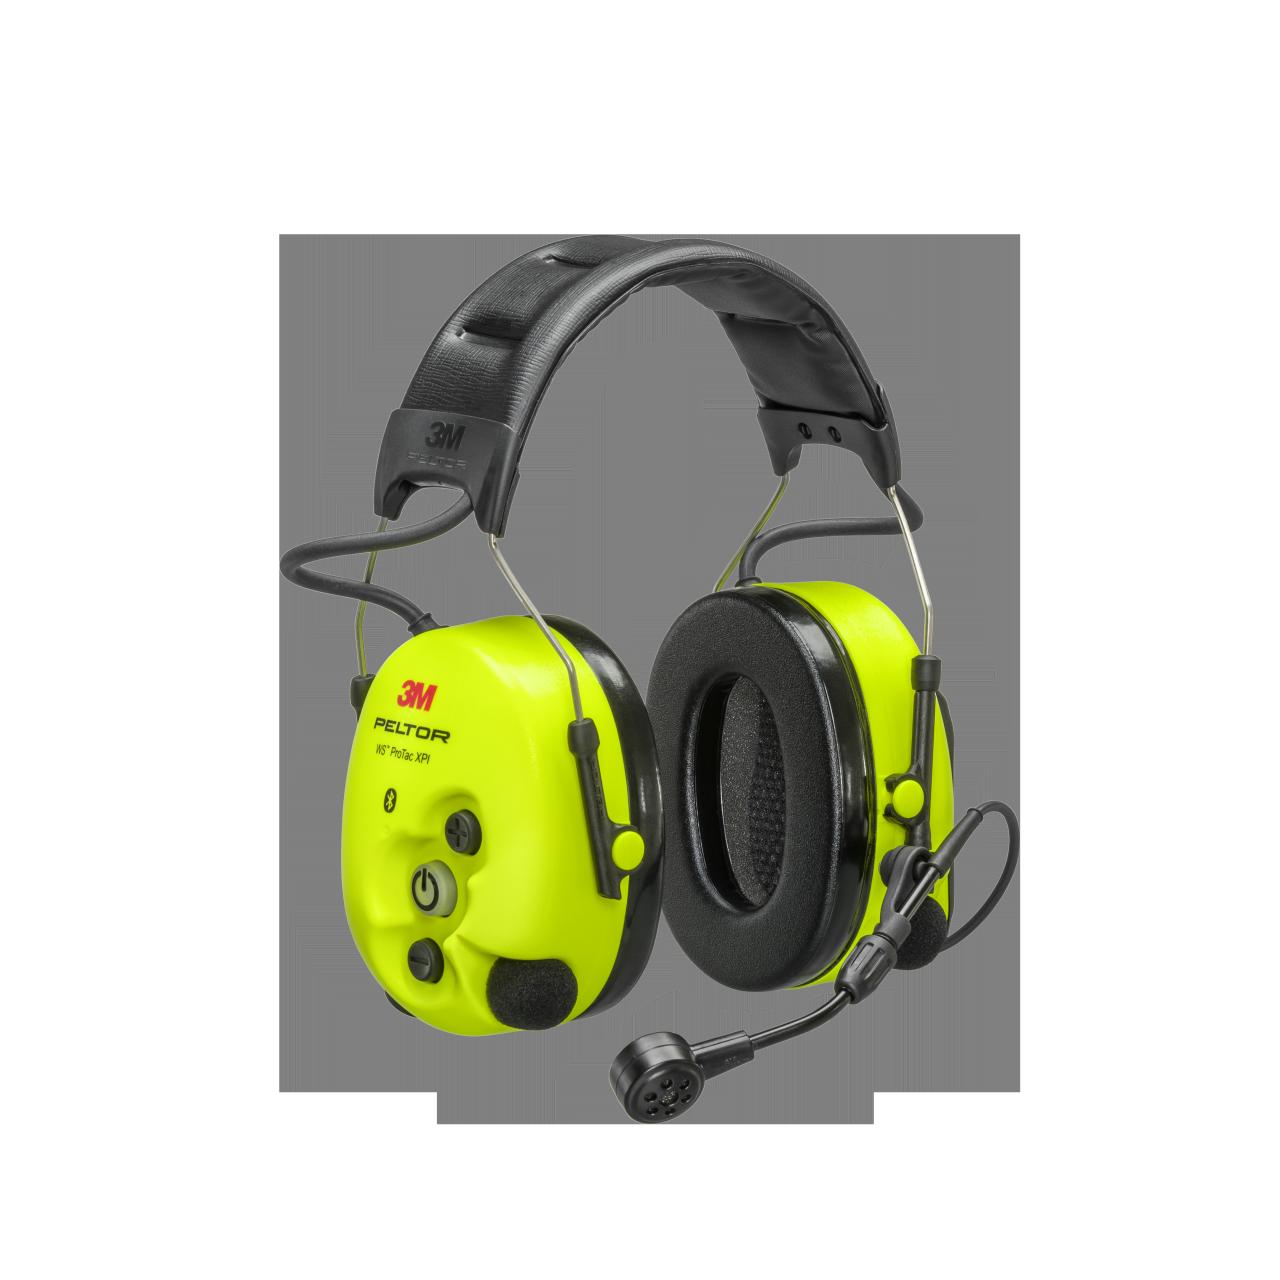 Photo casque anti-bruit actif HS-PEACSTB-FLEX